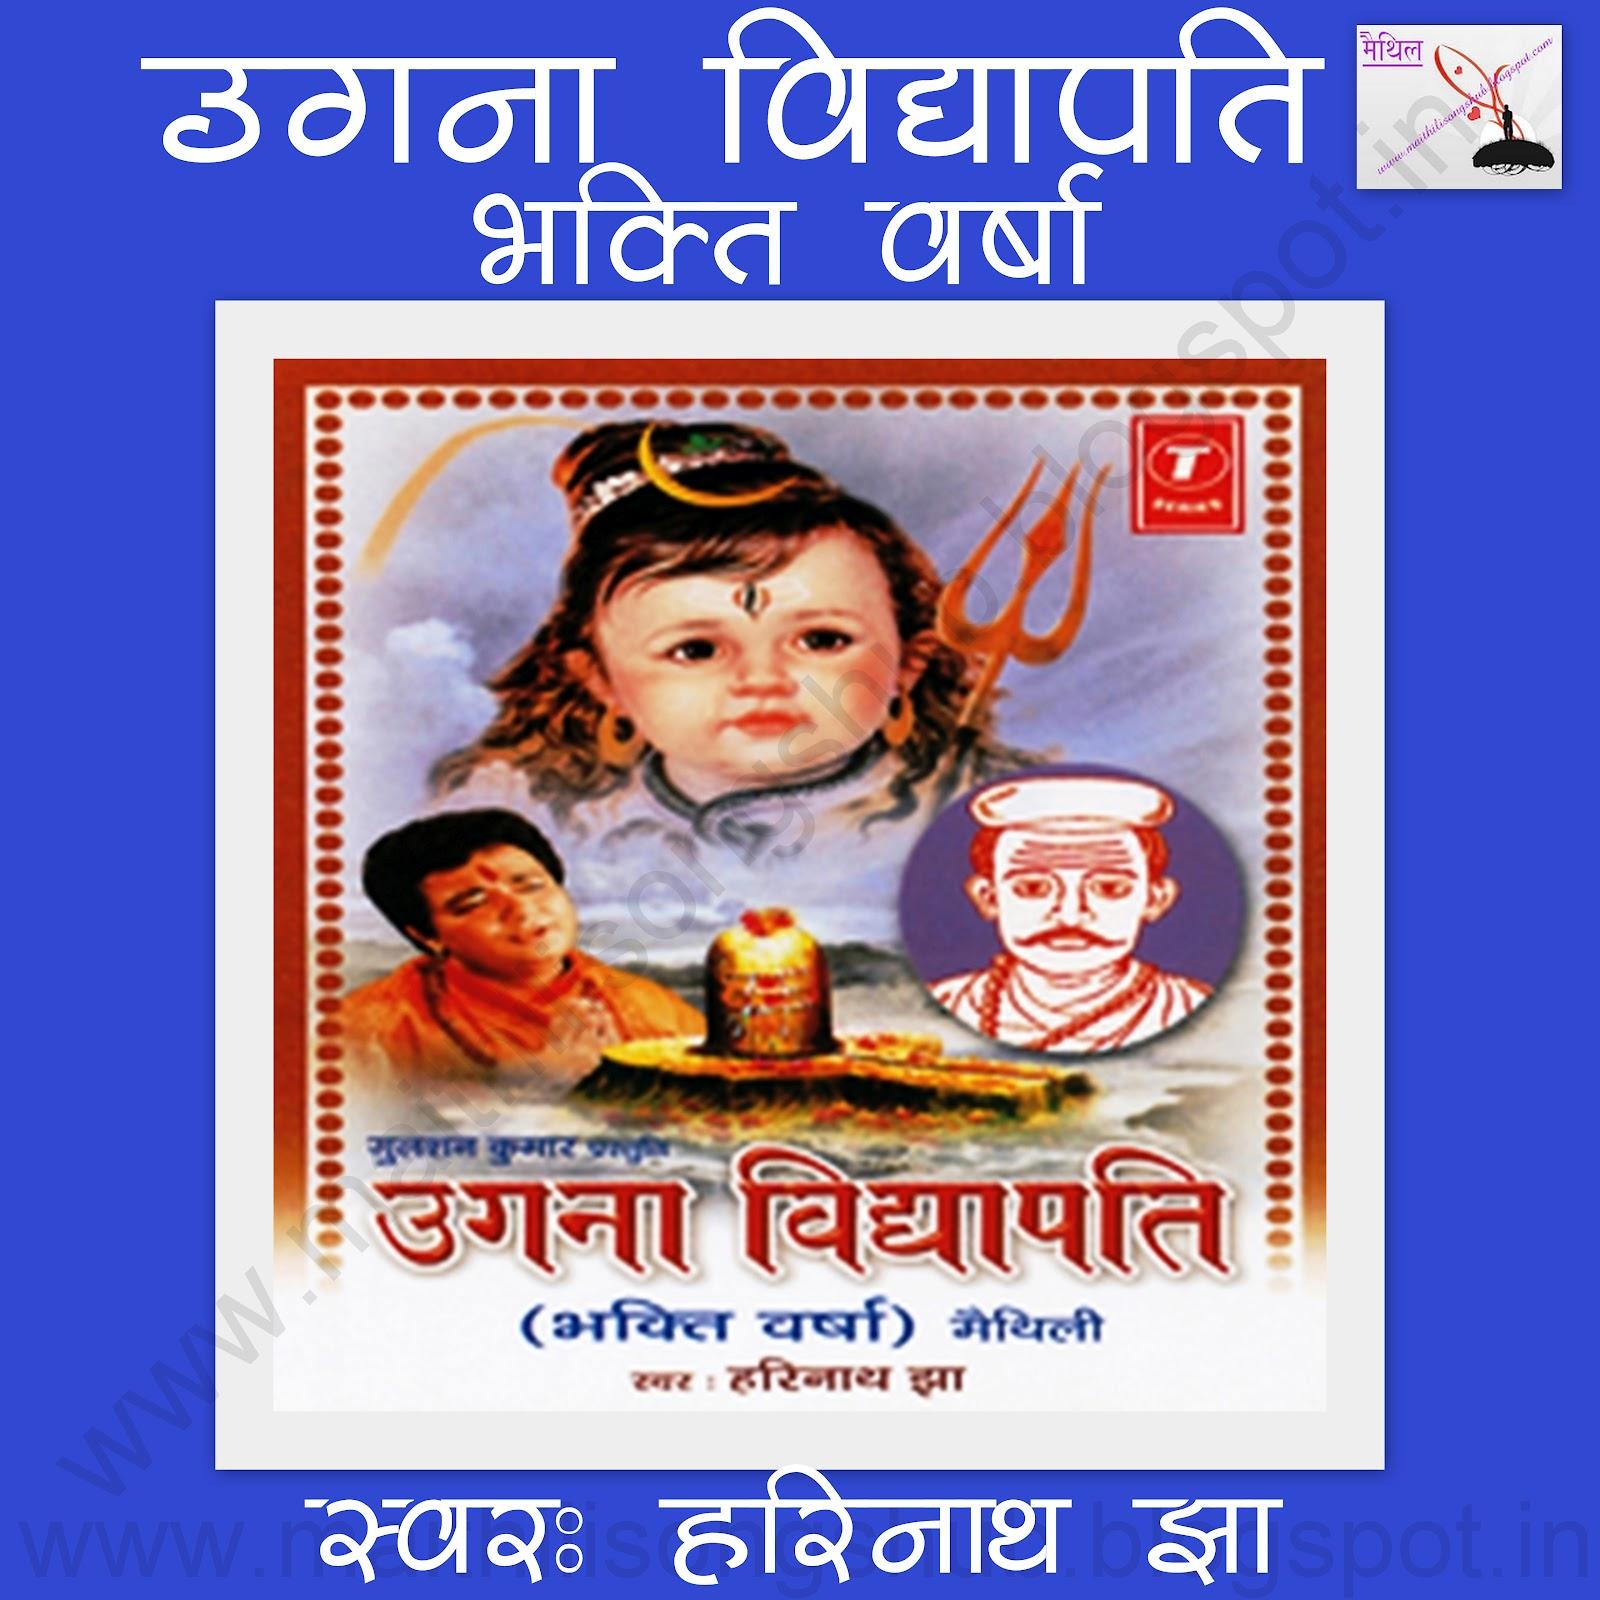 new bhajan video download mp3